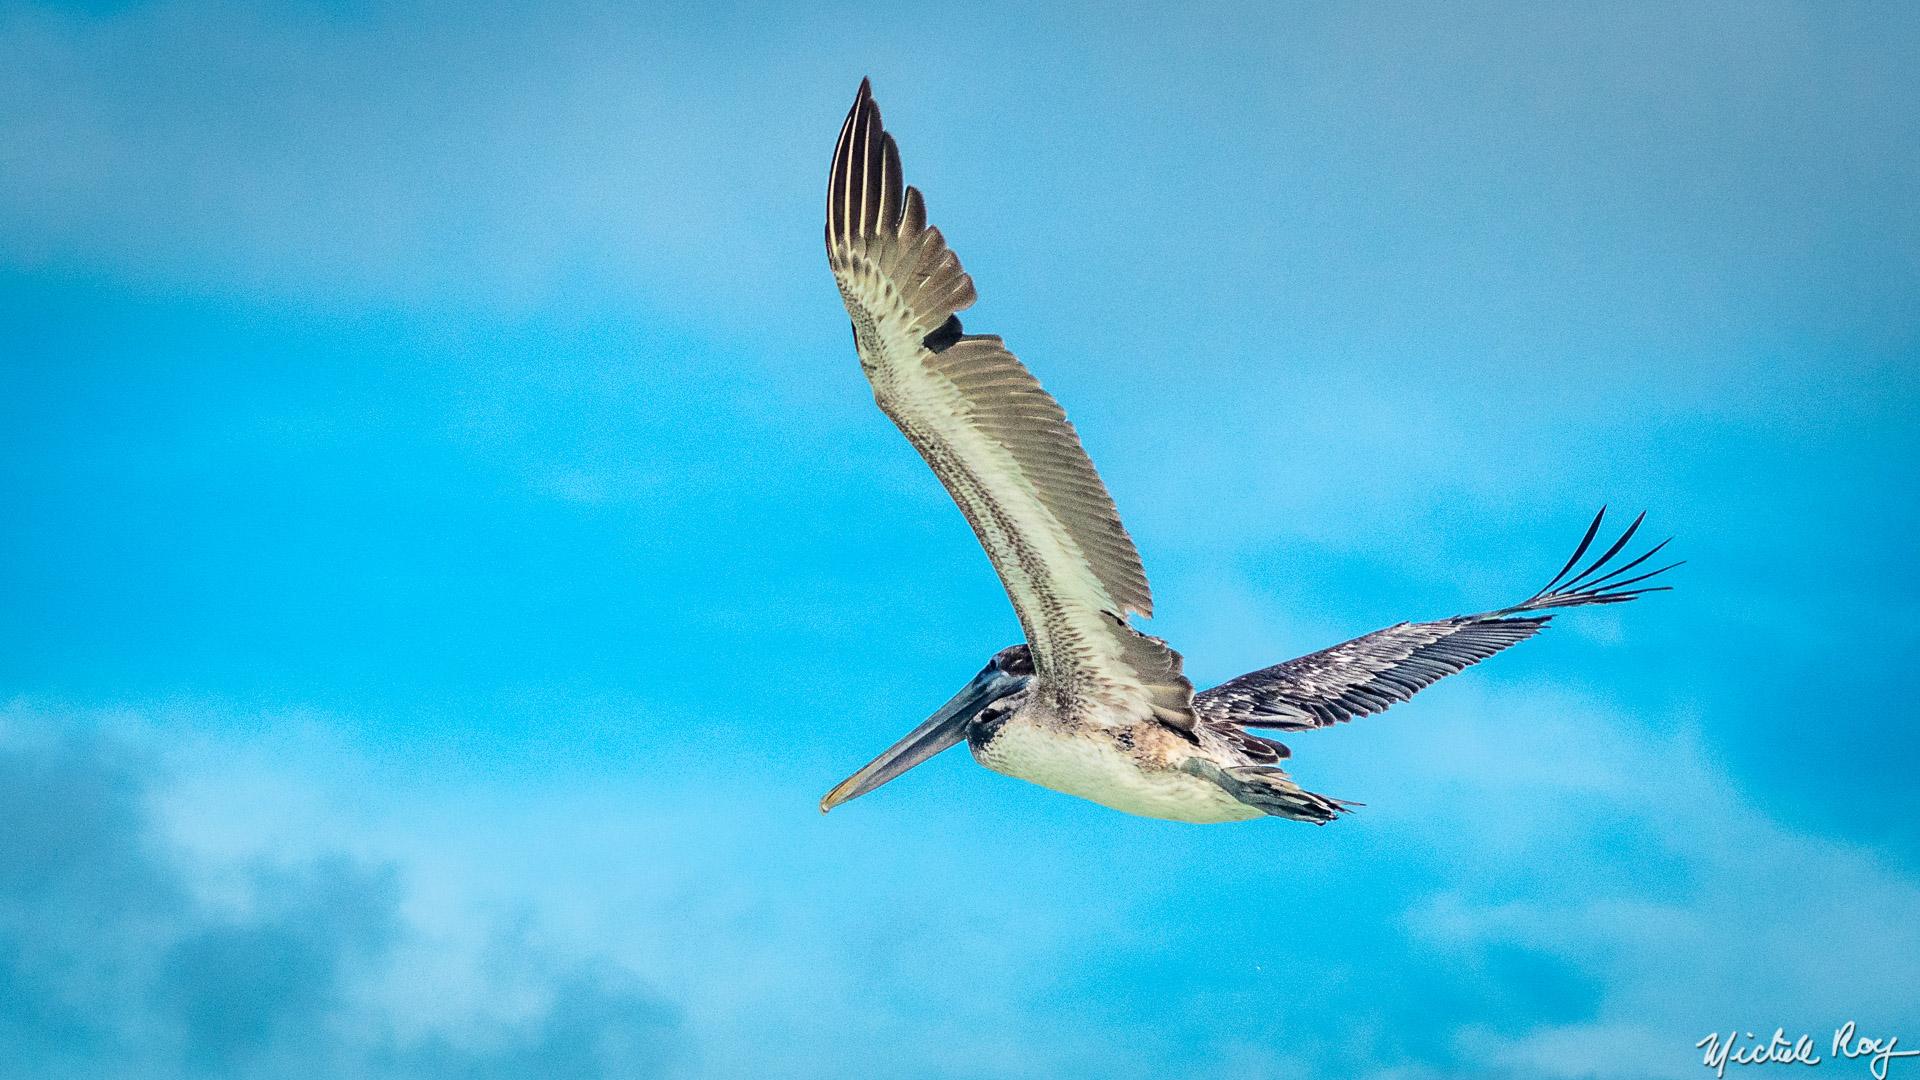 Pélican en croisière / Pelican crusing